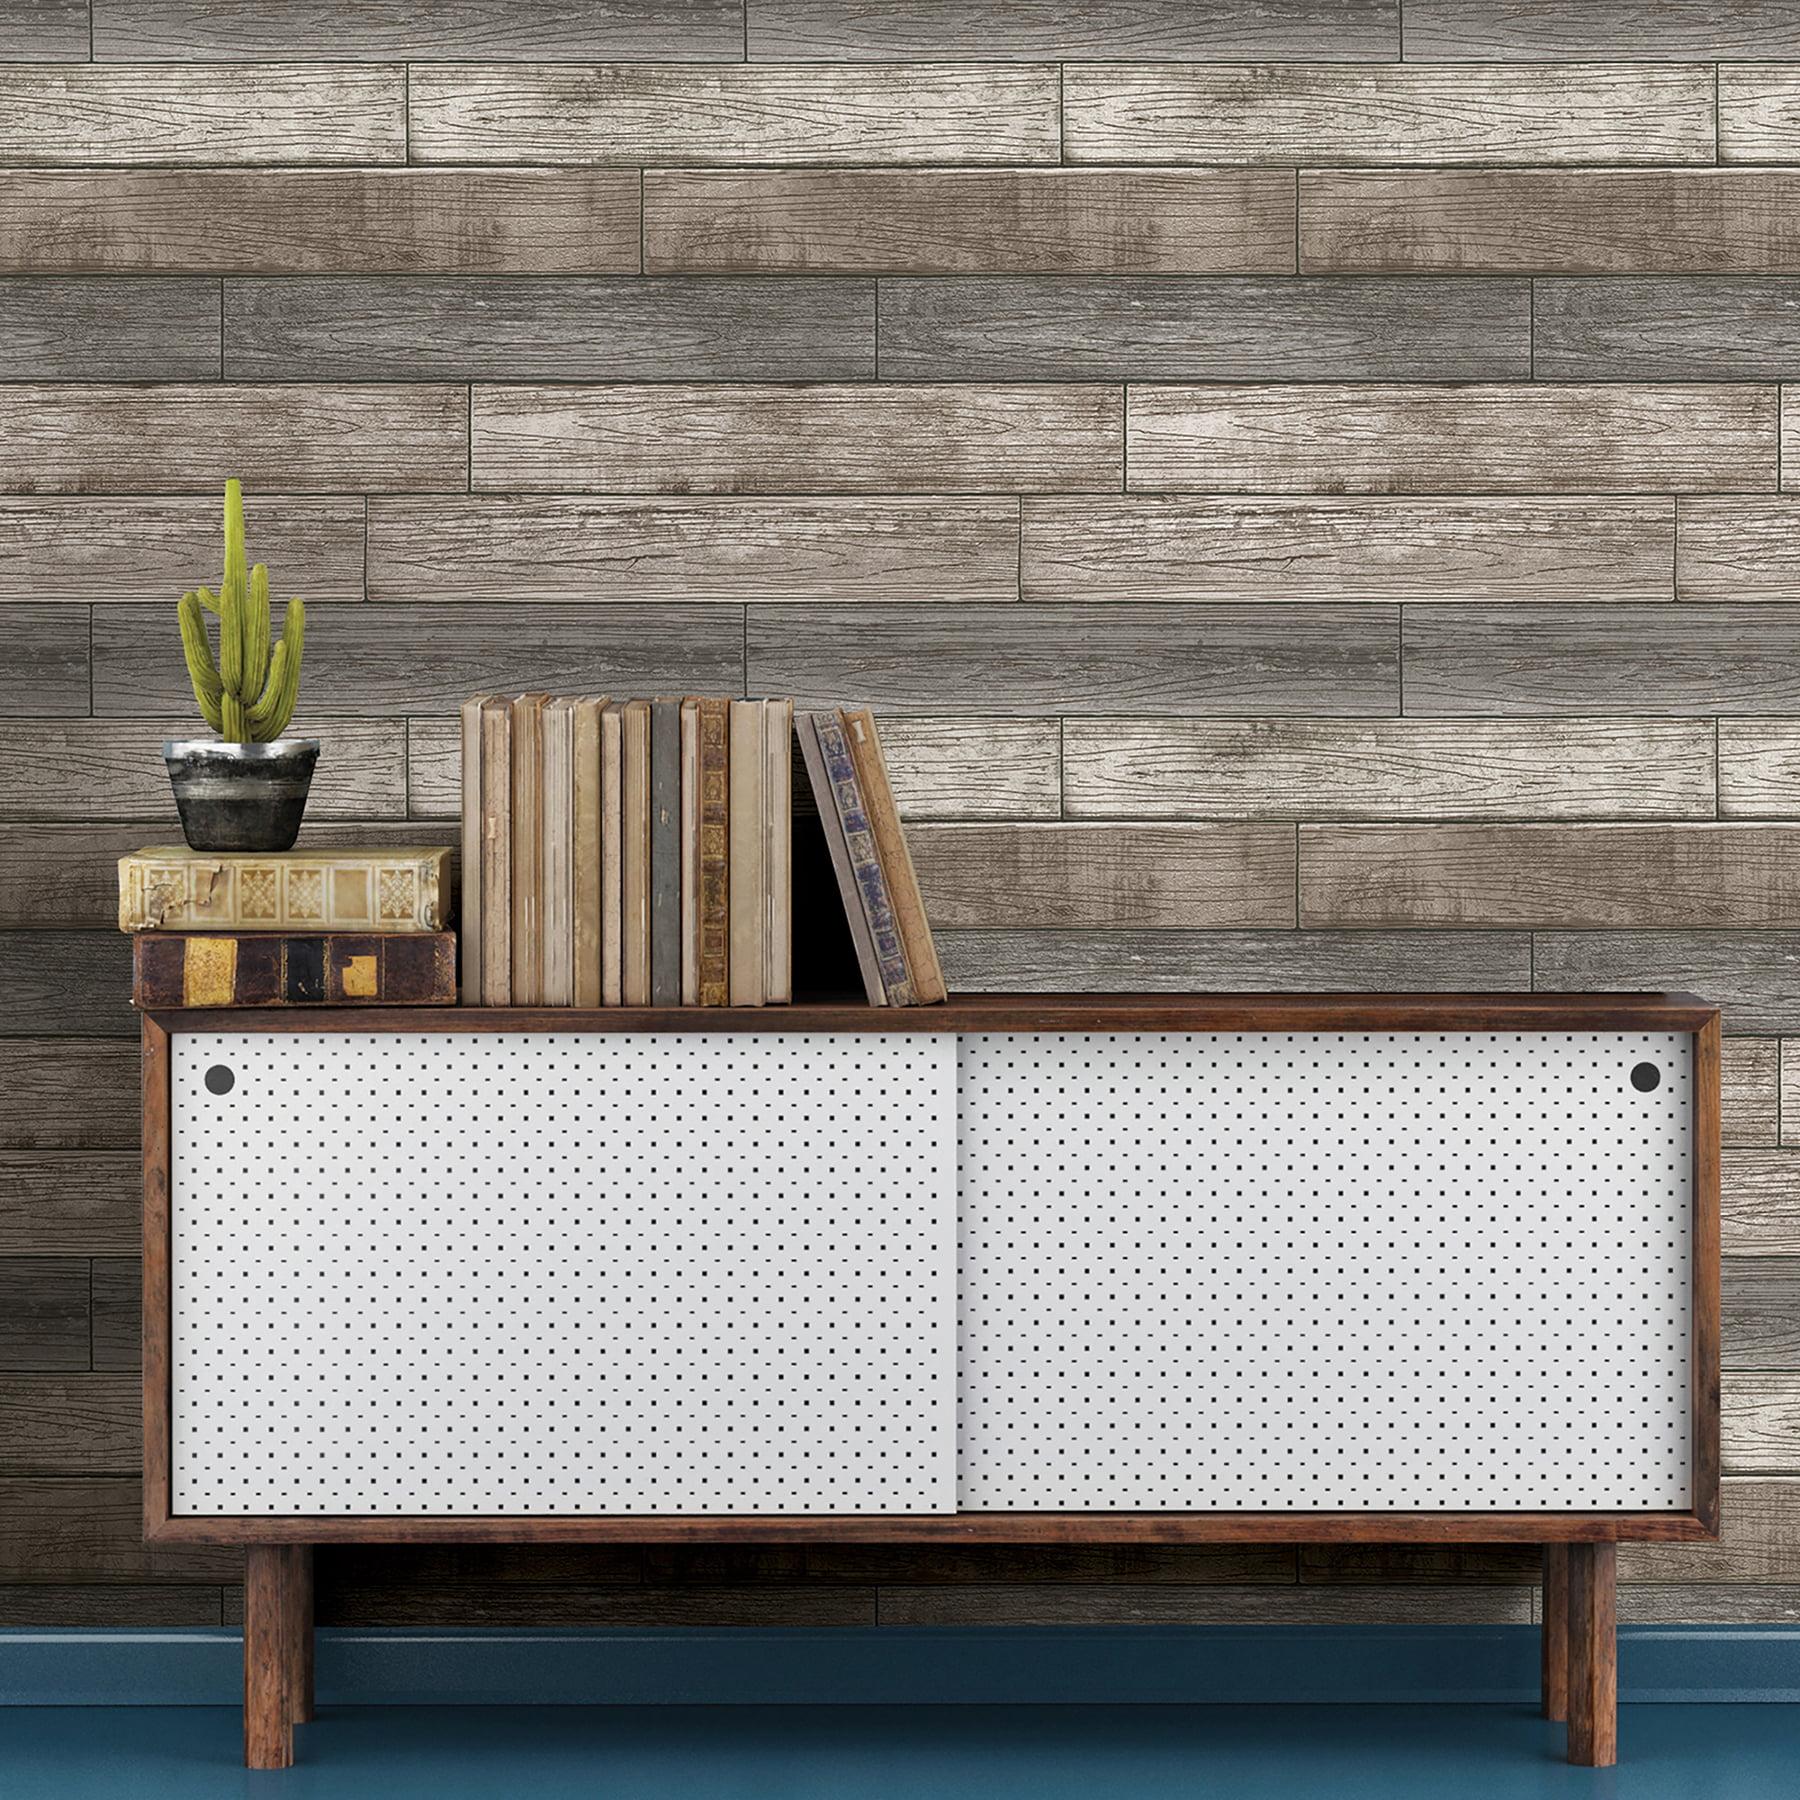 Nuwallpaper Reclaimed Wood Plank Natural Peel Stick Wallpaper Walmart Com Walmart Com